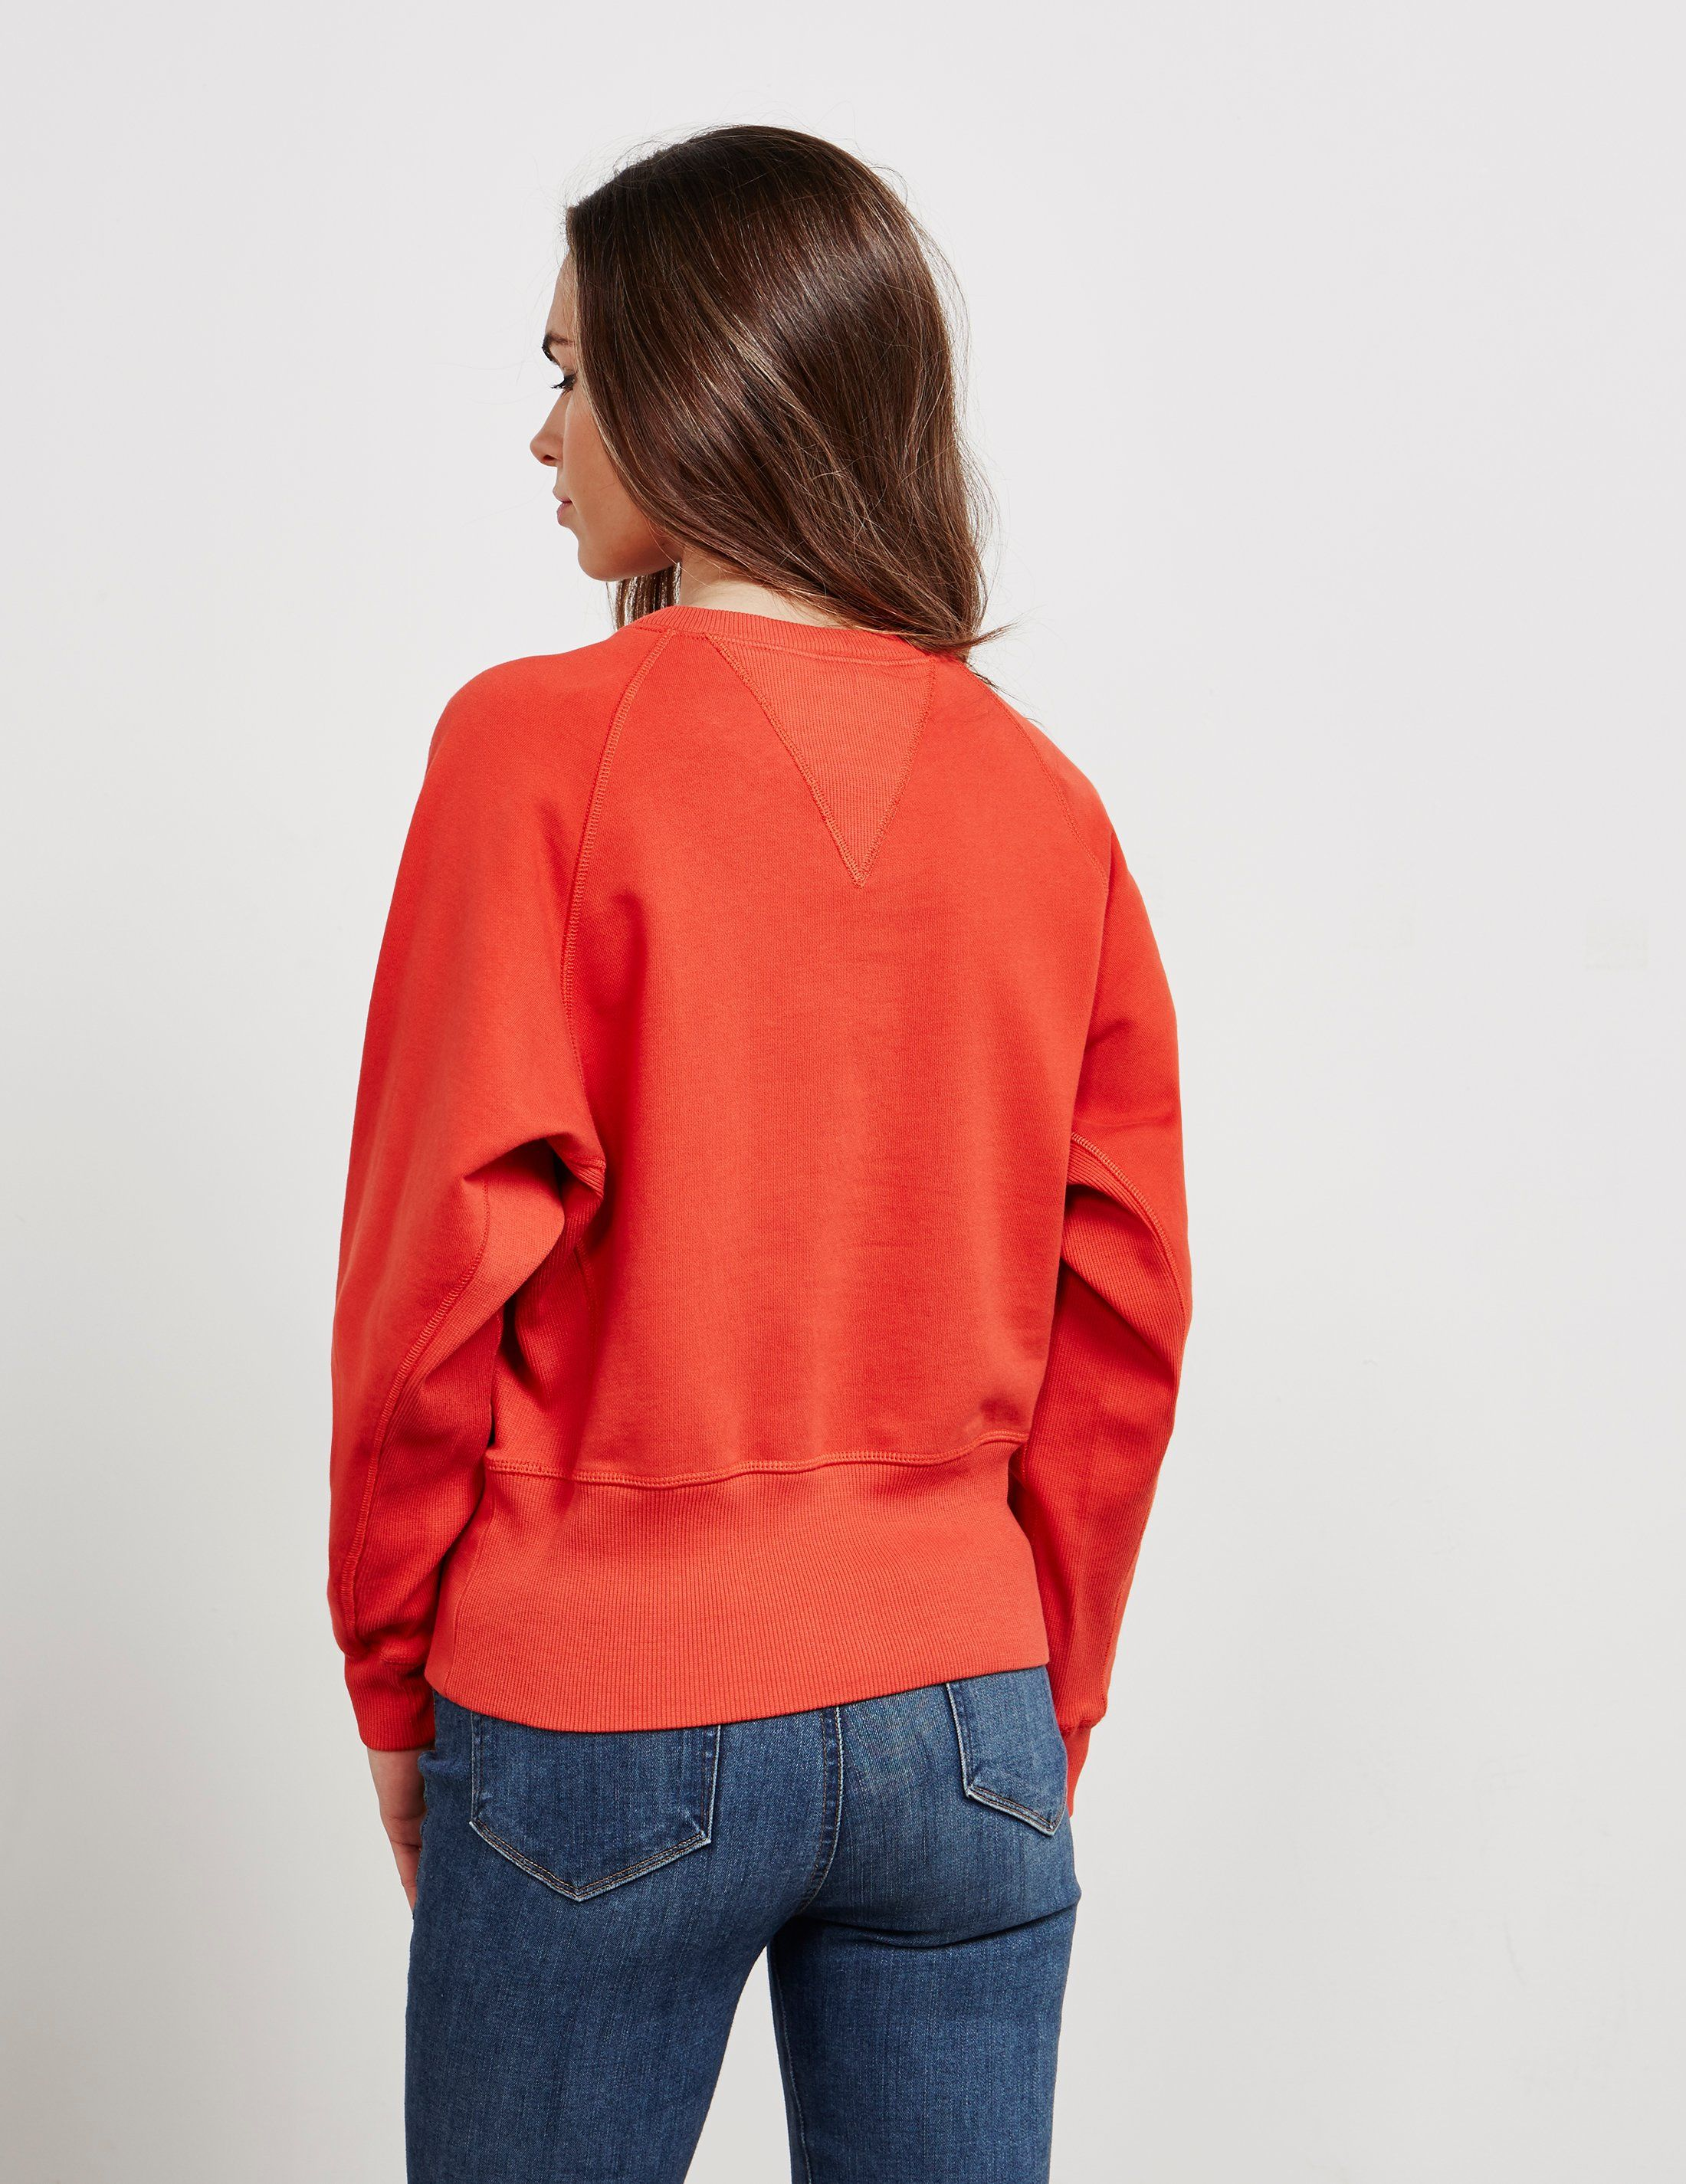 Vivienne Westwood Anglomania Athletic Sweatshirt